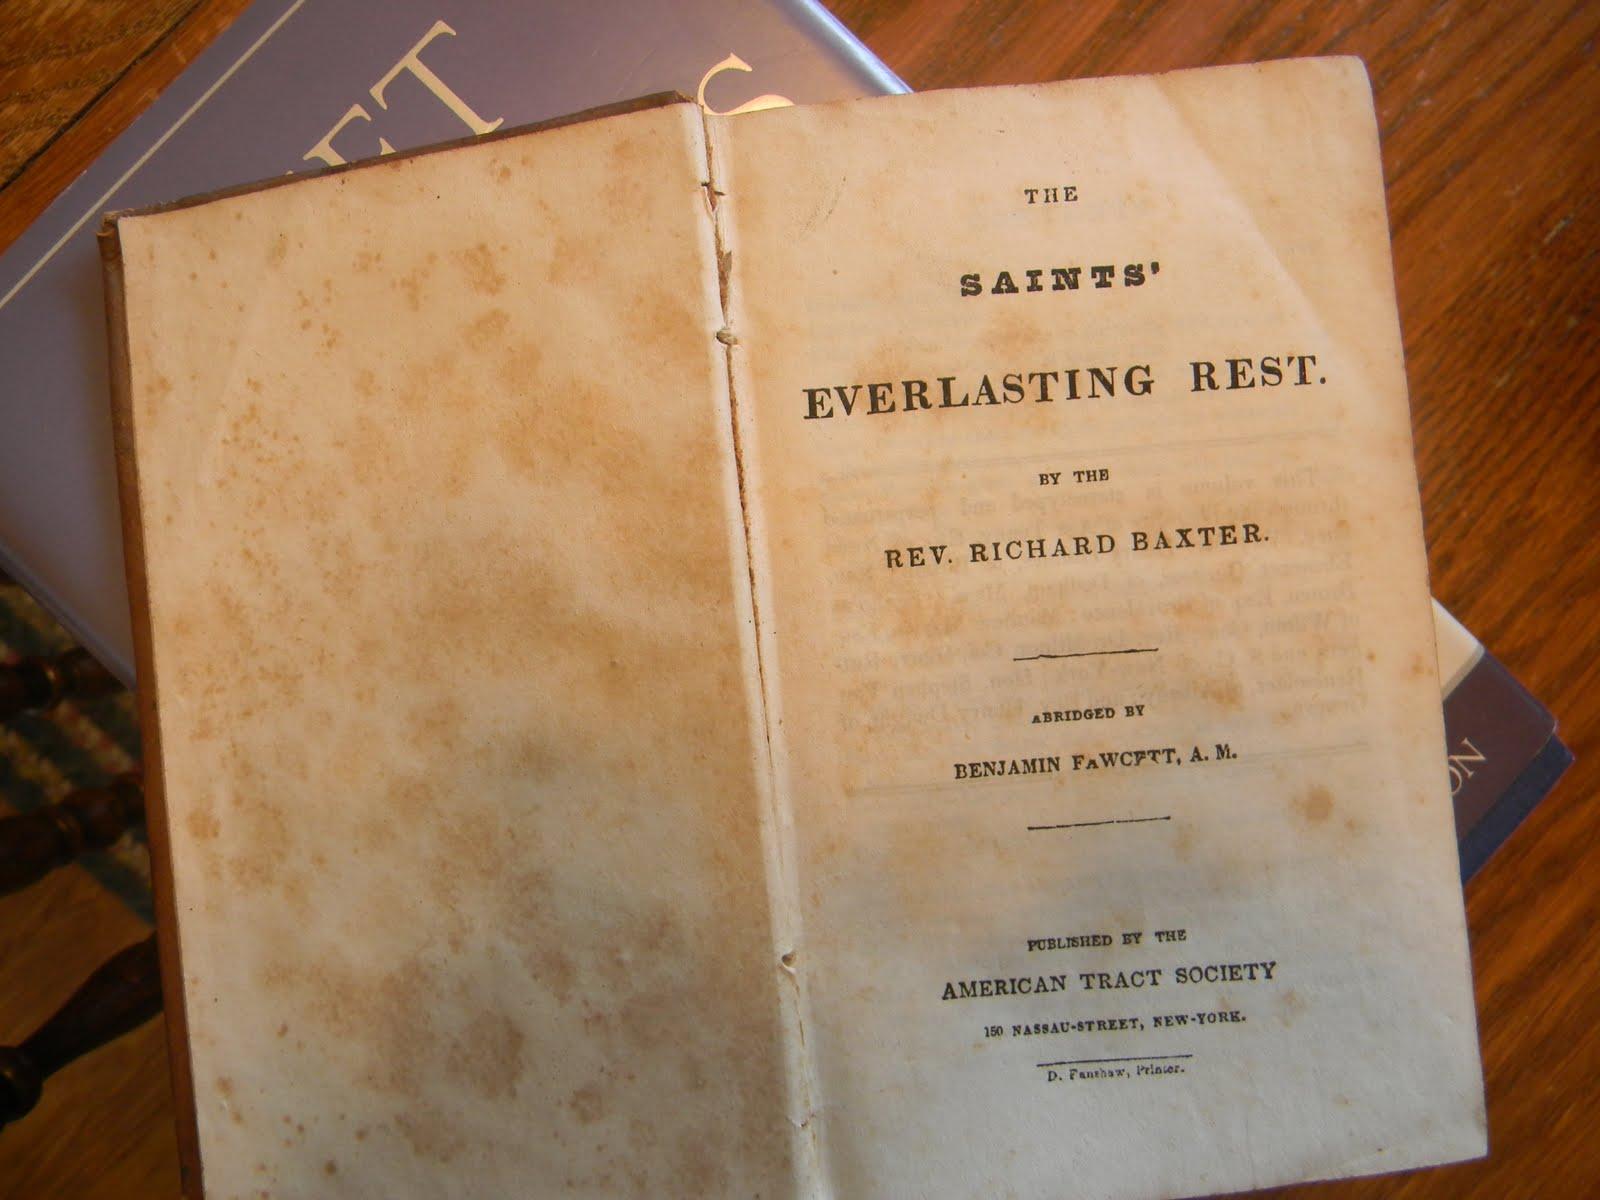 The Saint's Everlasting Rest by Richard Baxter